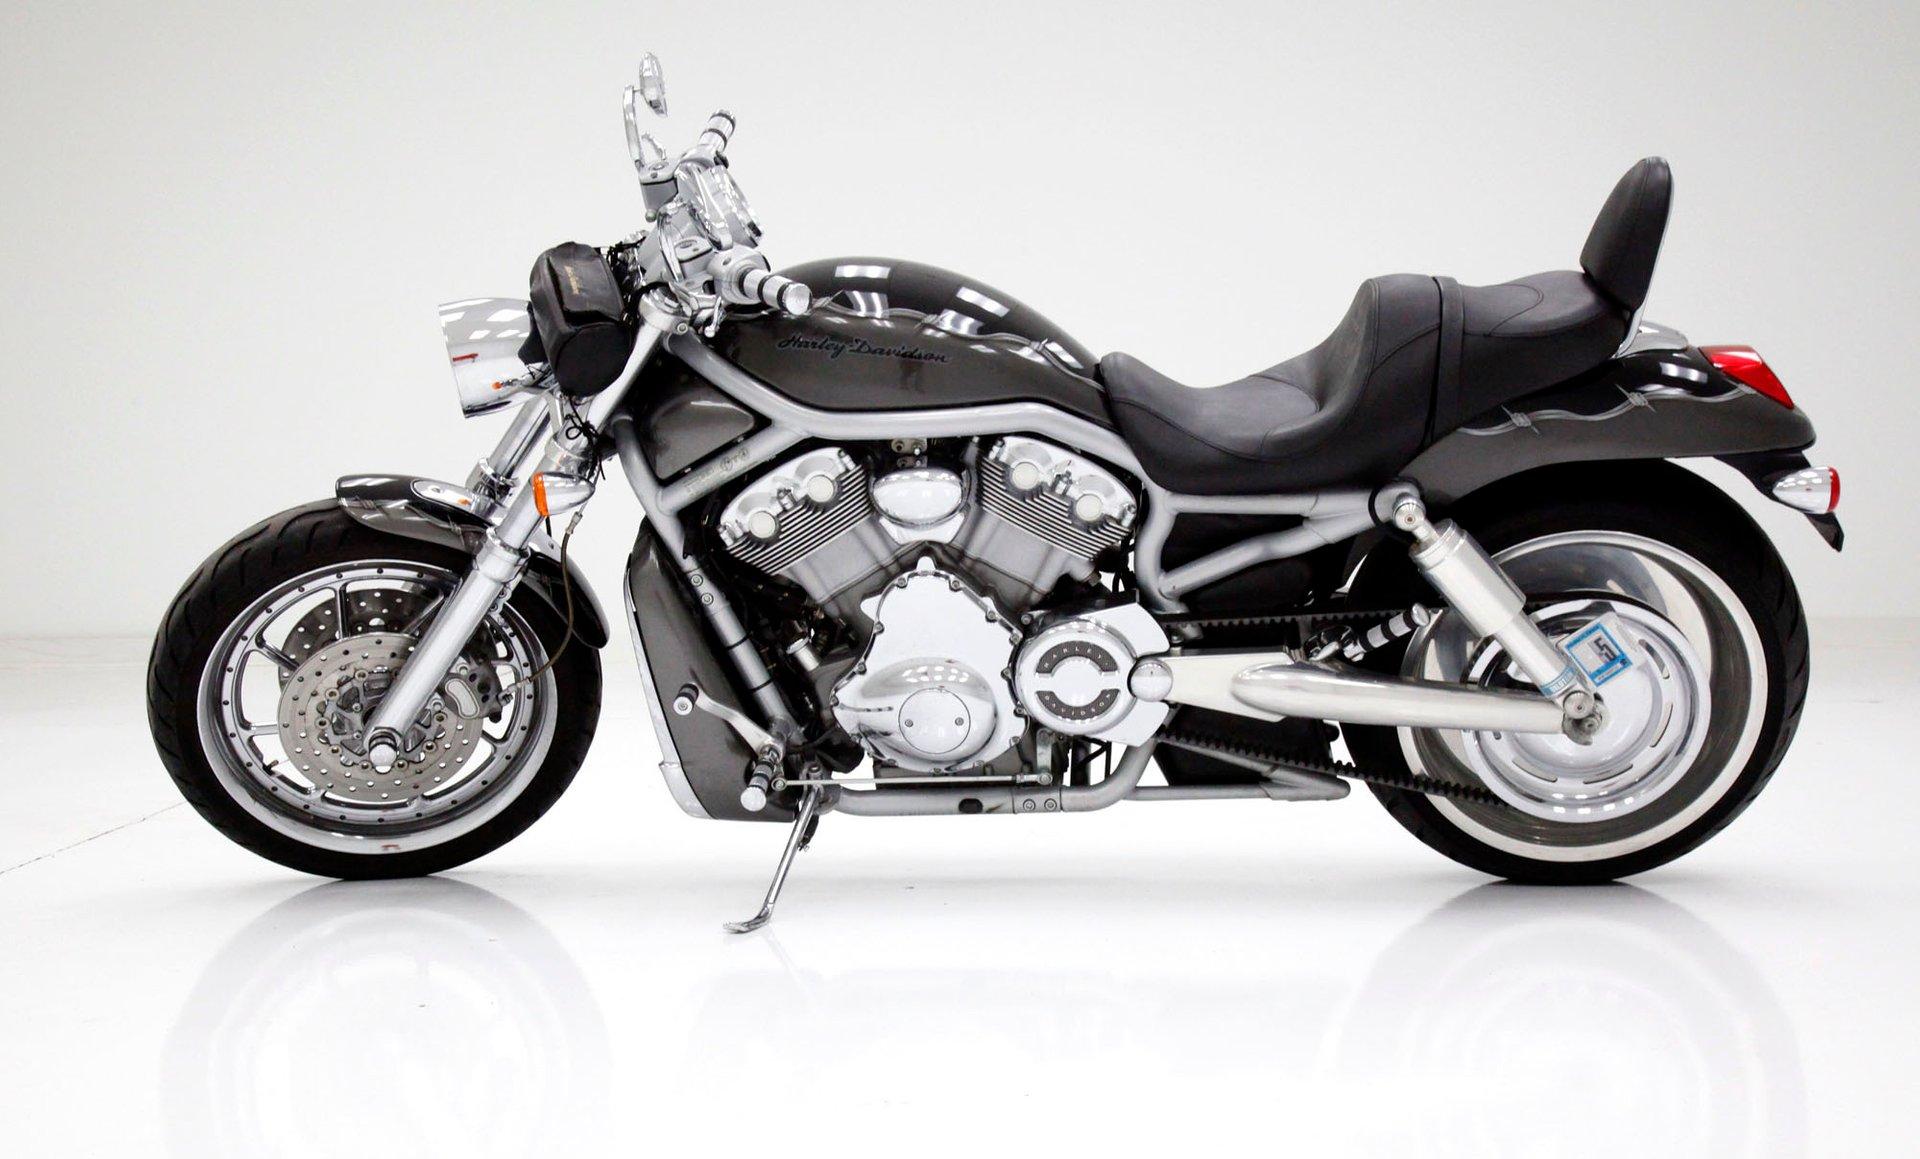 2002 Harley-Davidson V Rod